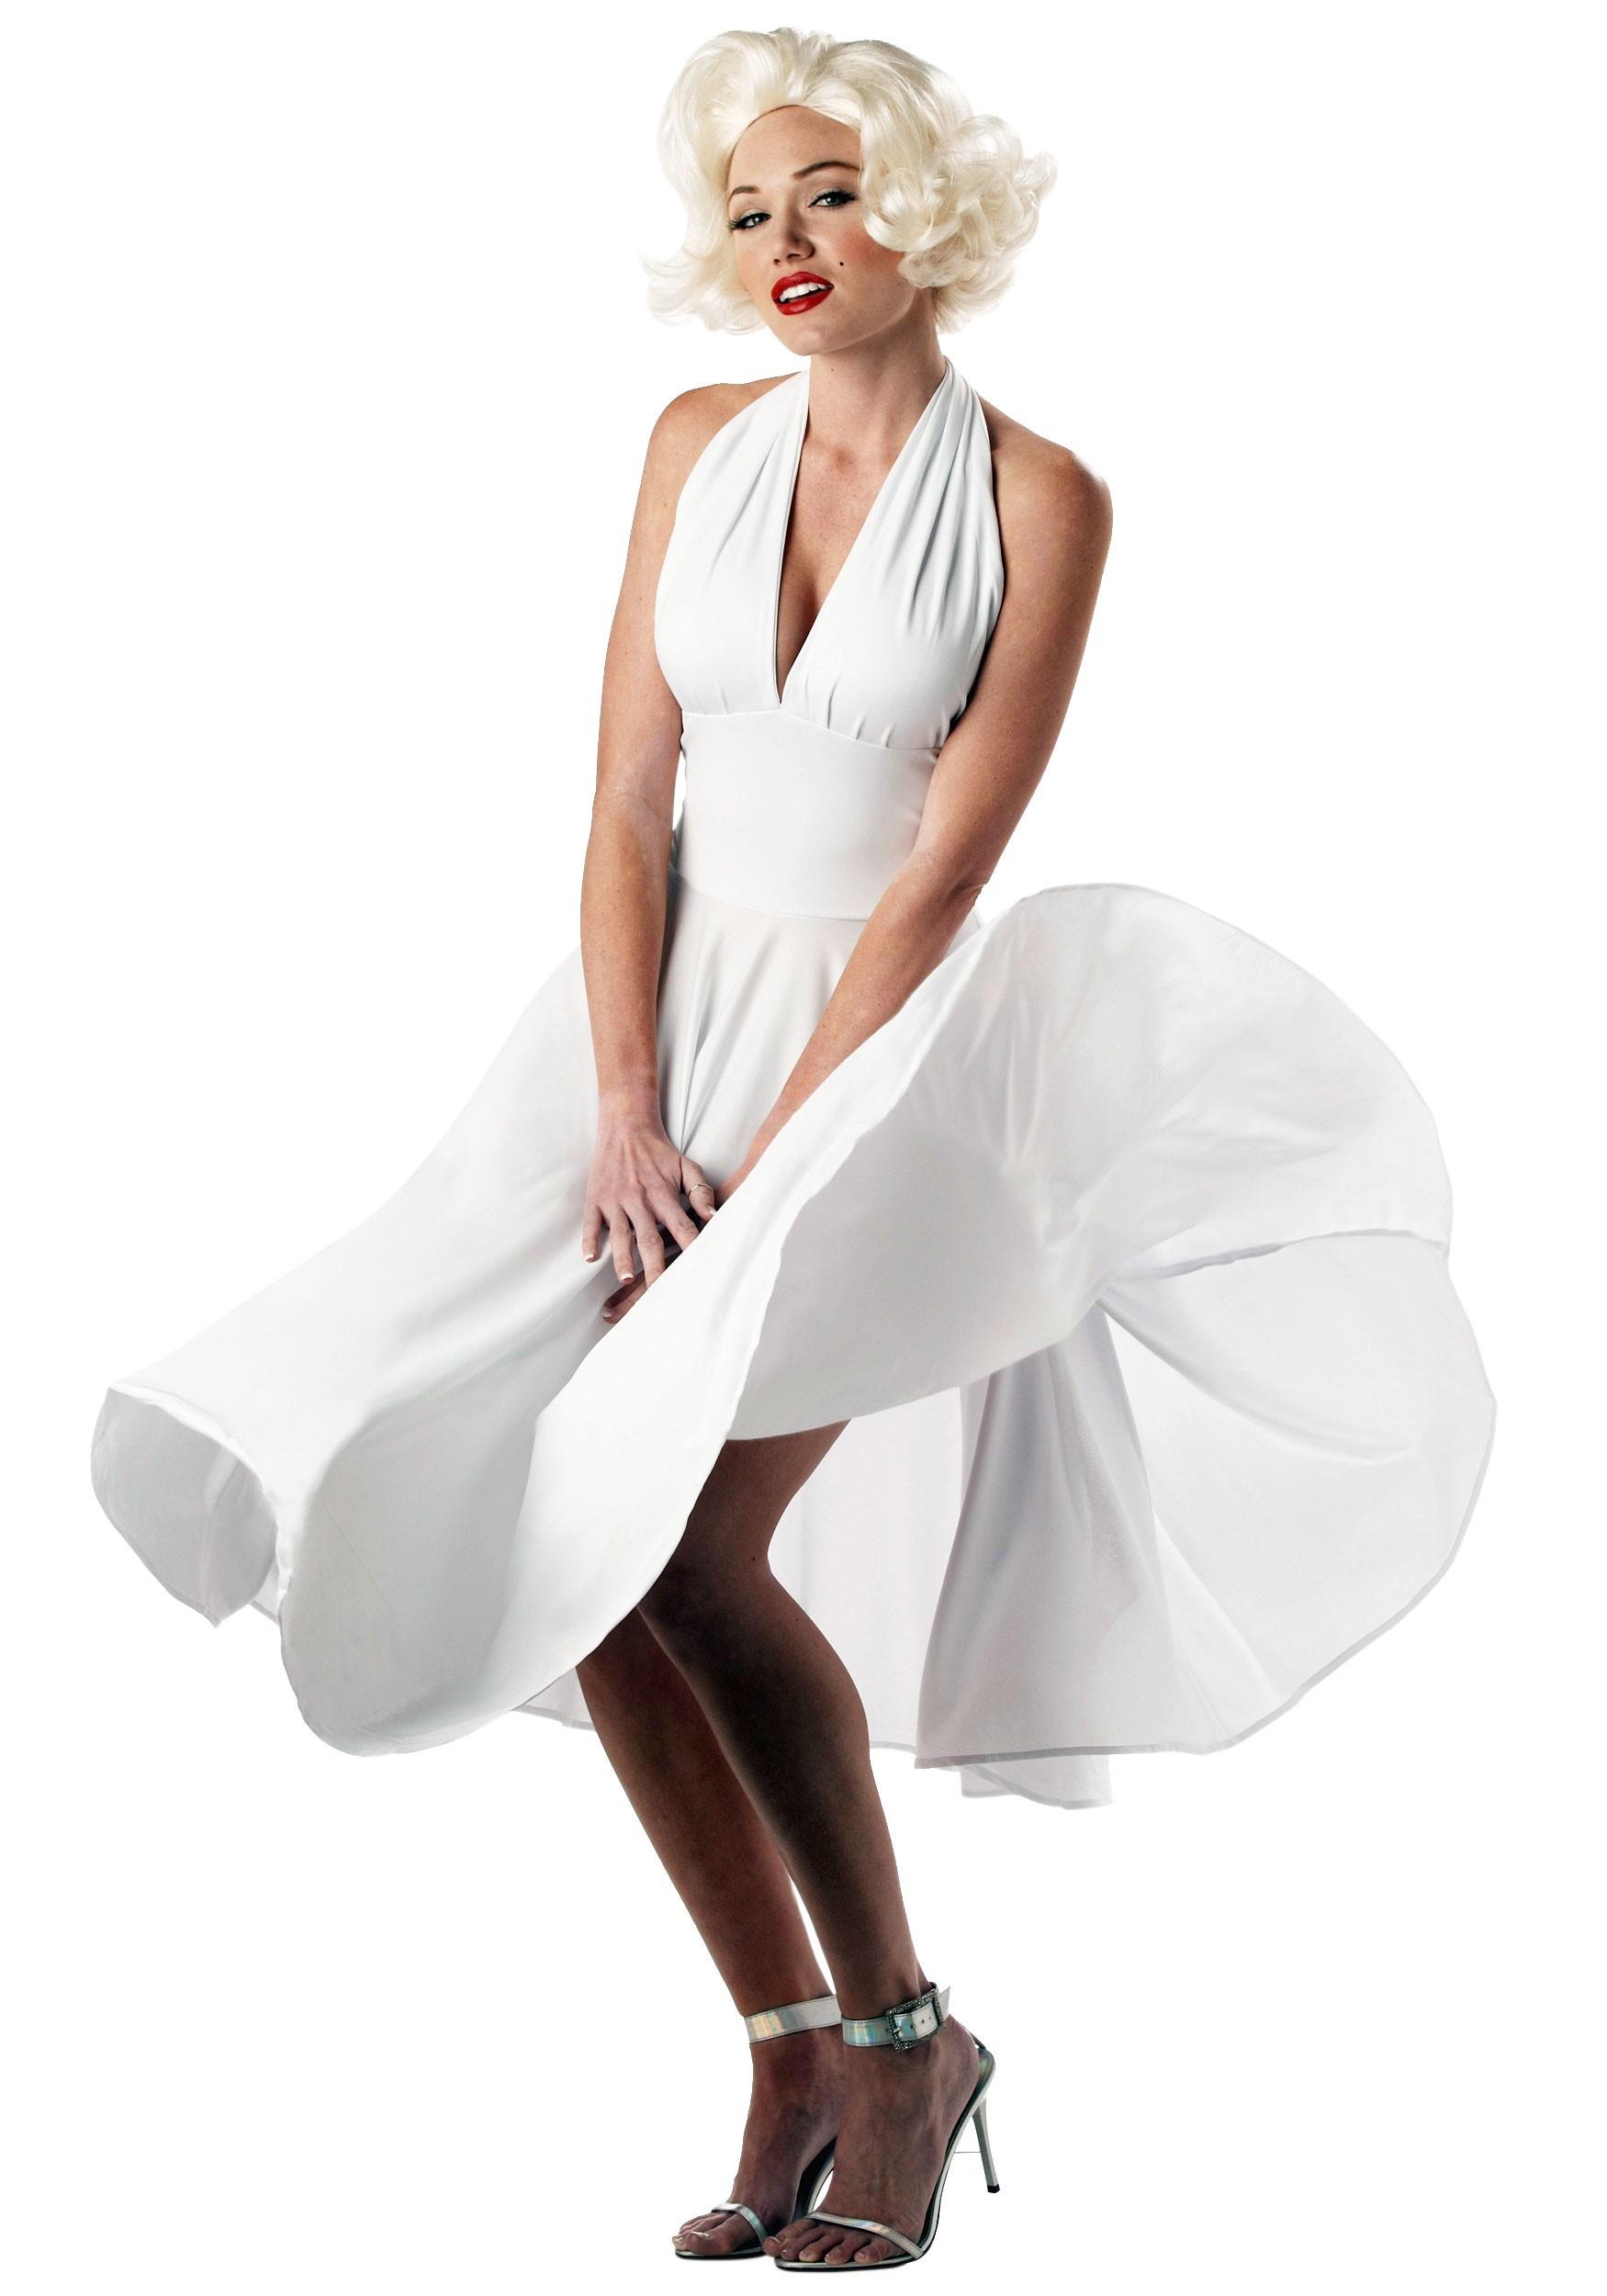 Marilyn Monroe Dress Costume | Sexy White Costume Dress